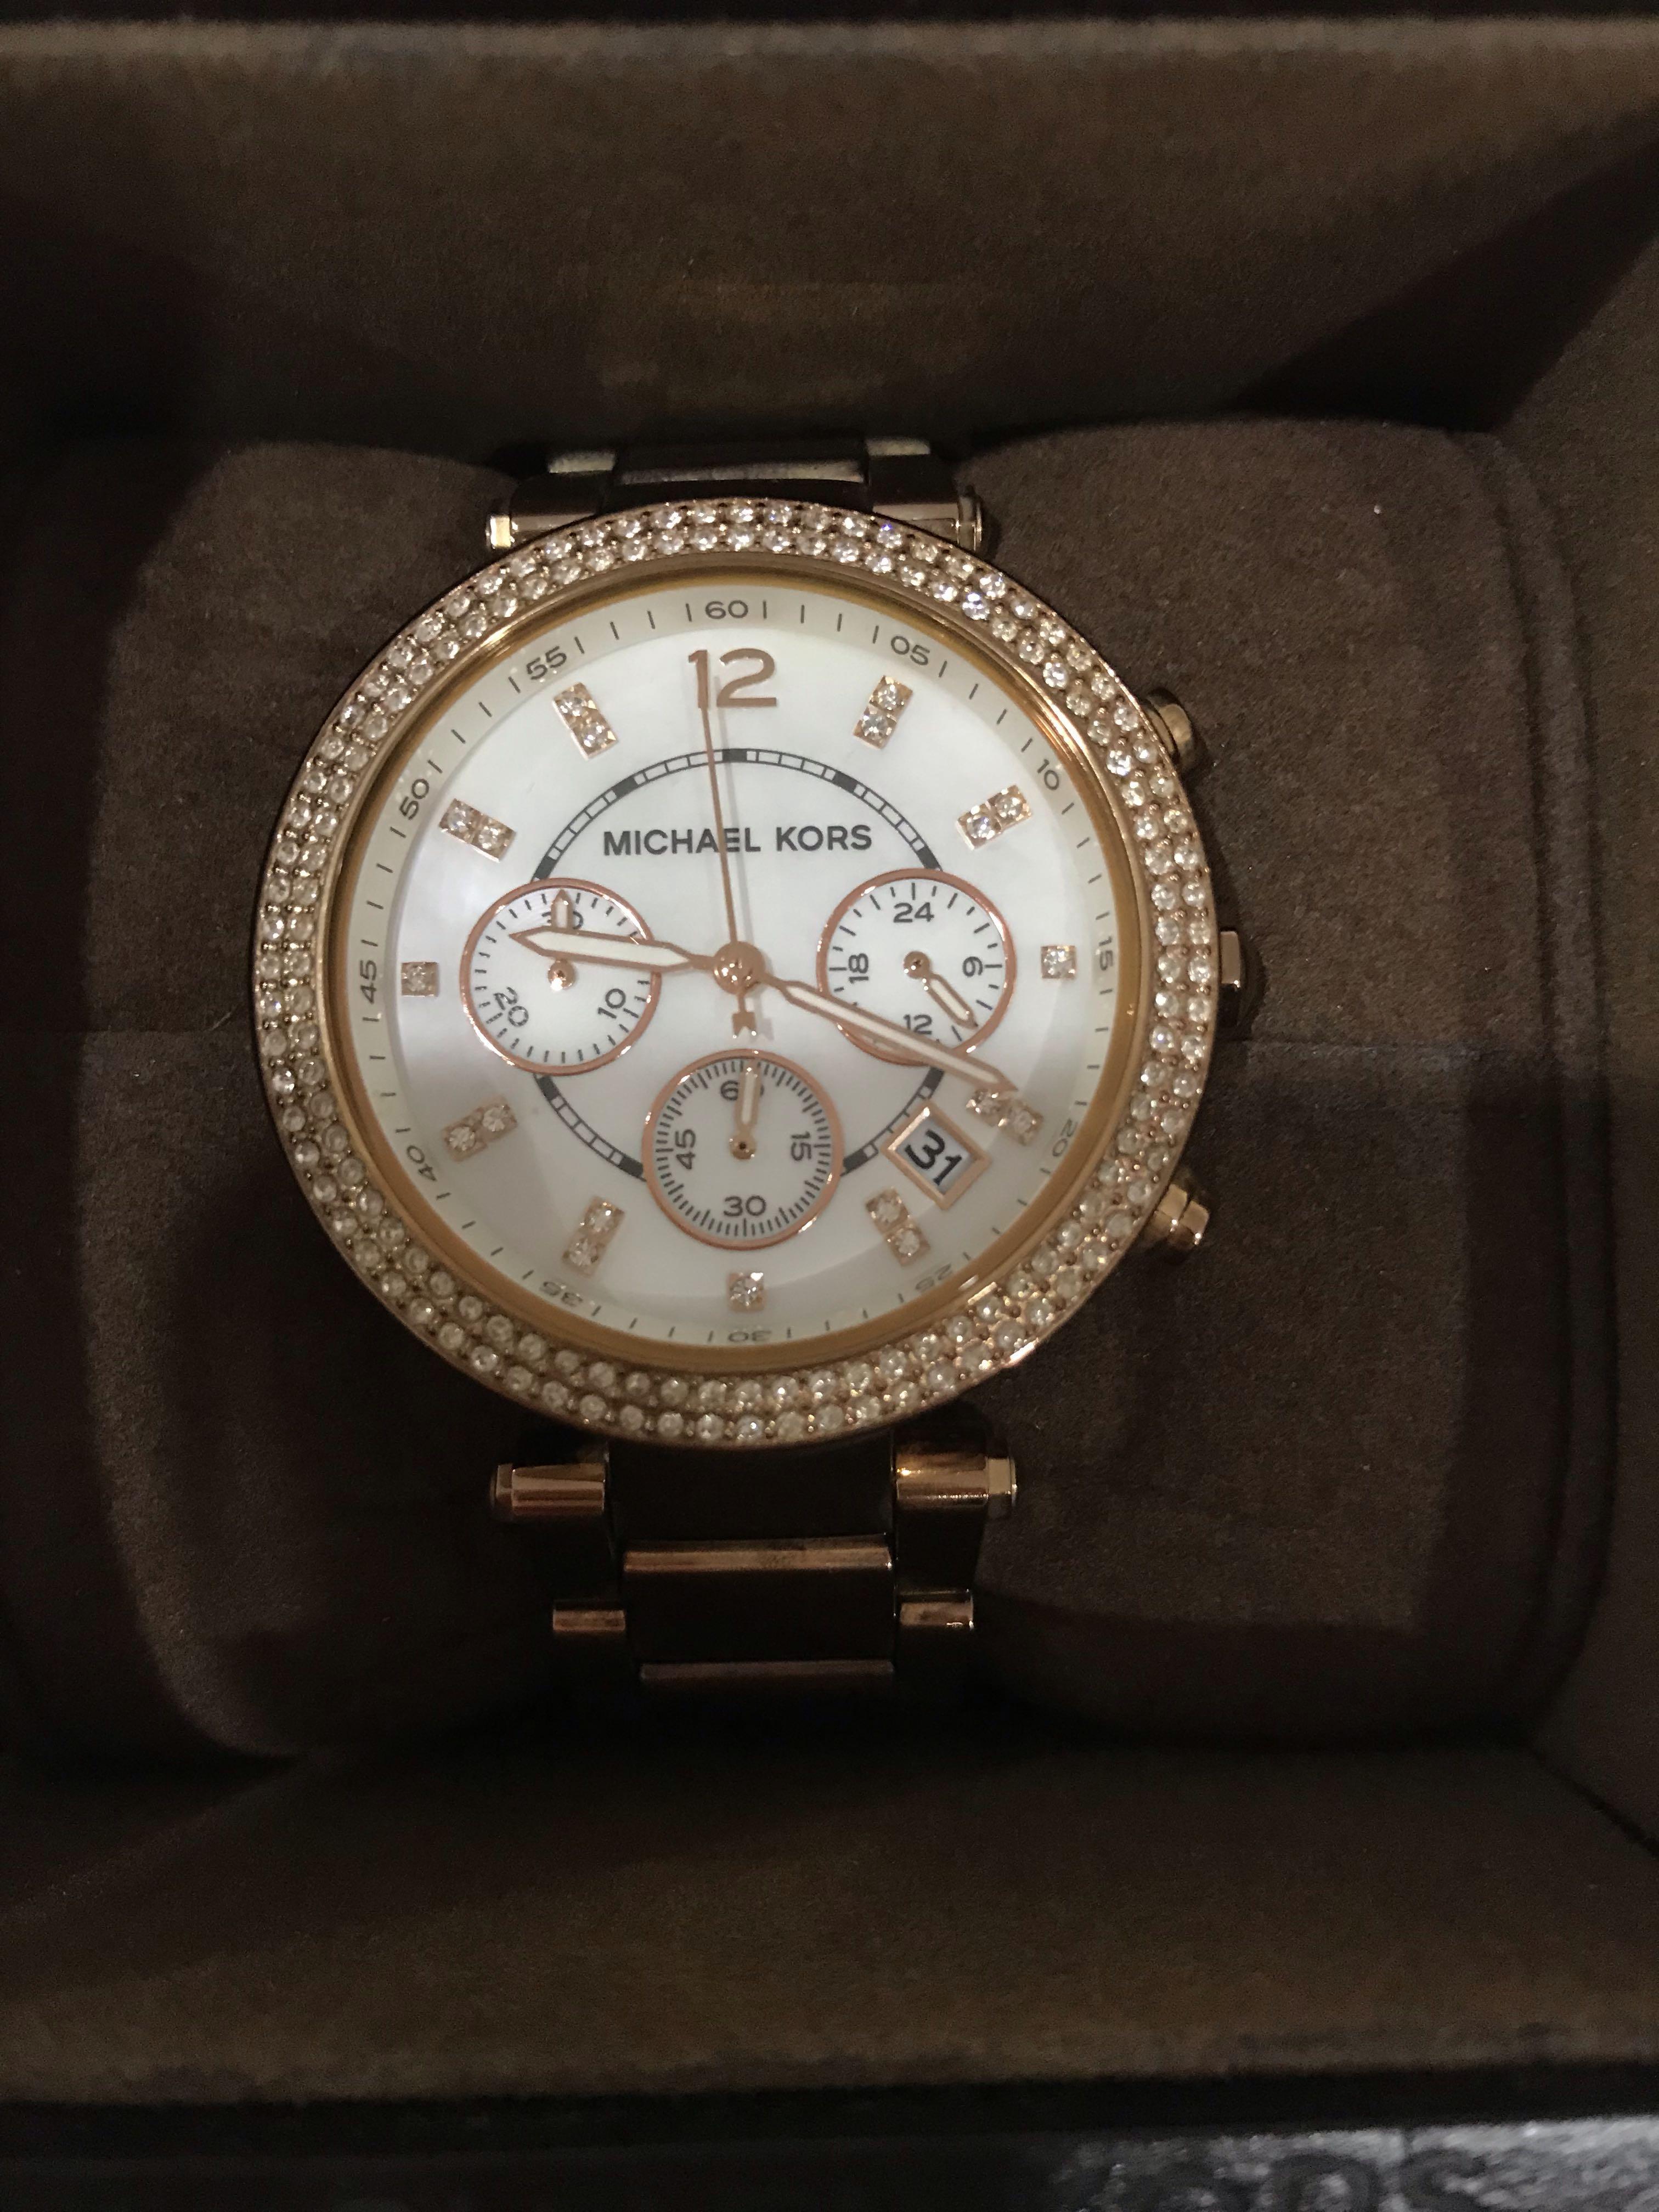 Michael kors Rose Gold watch (Original price $529)